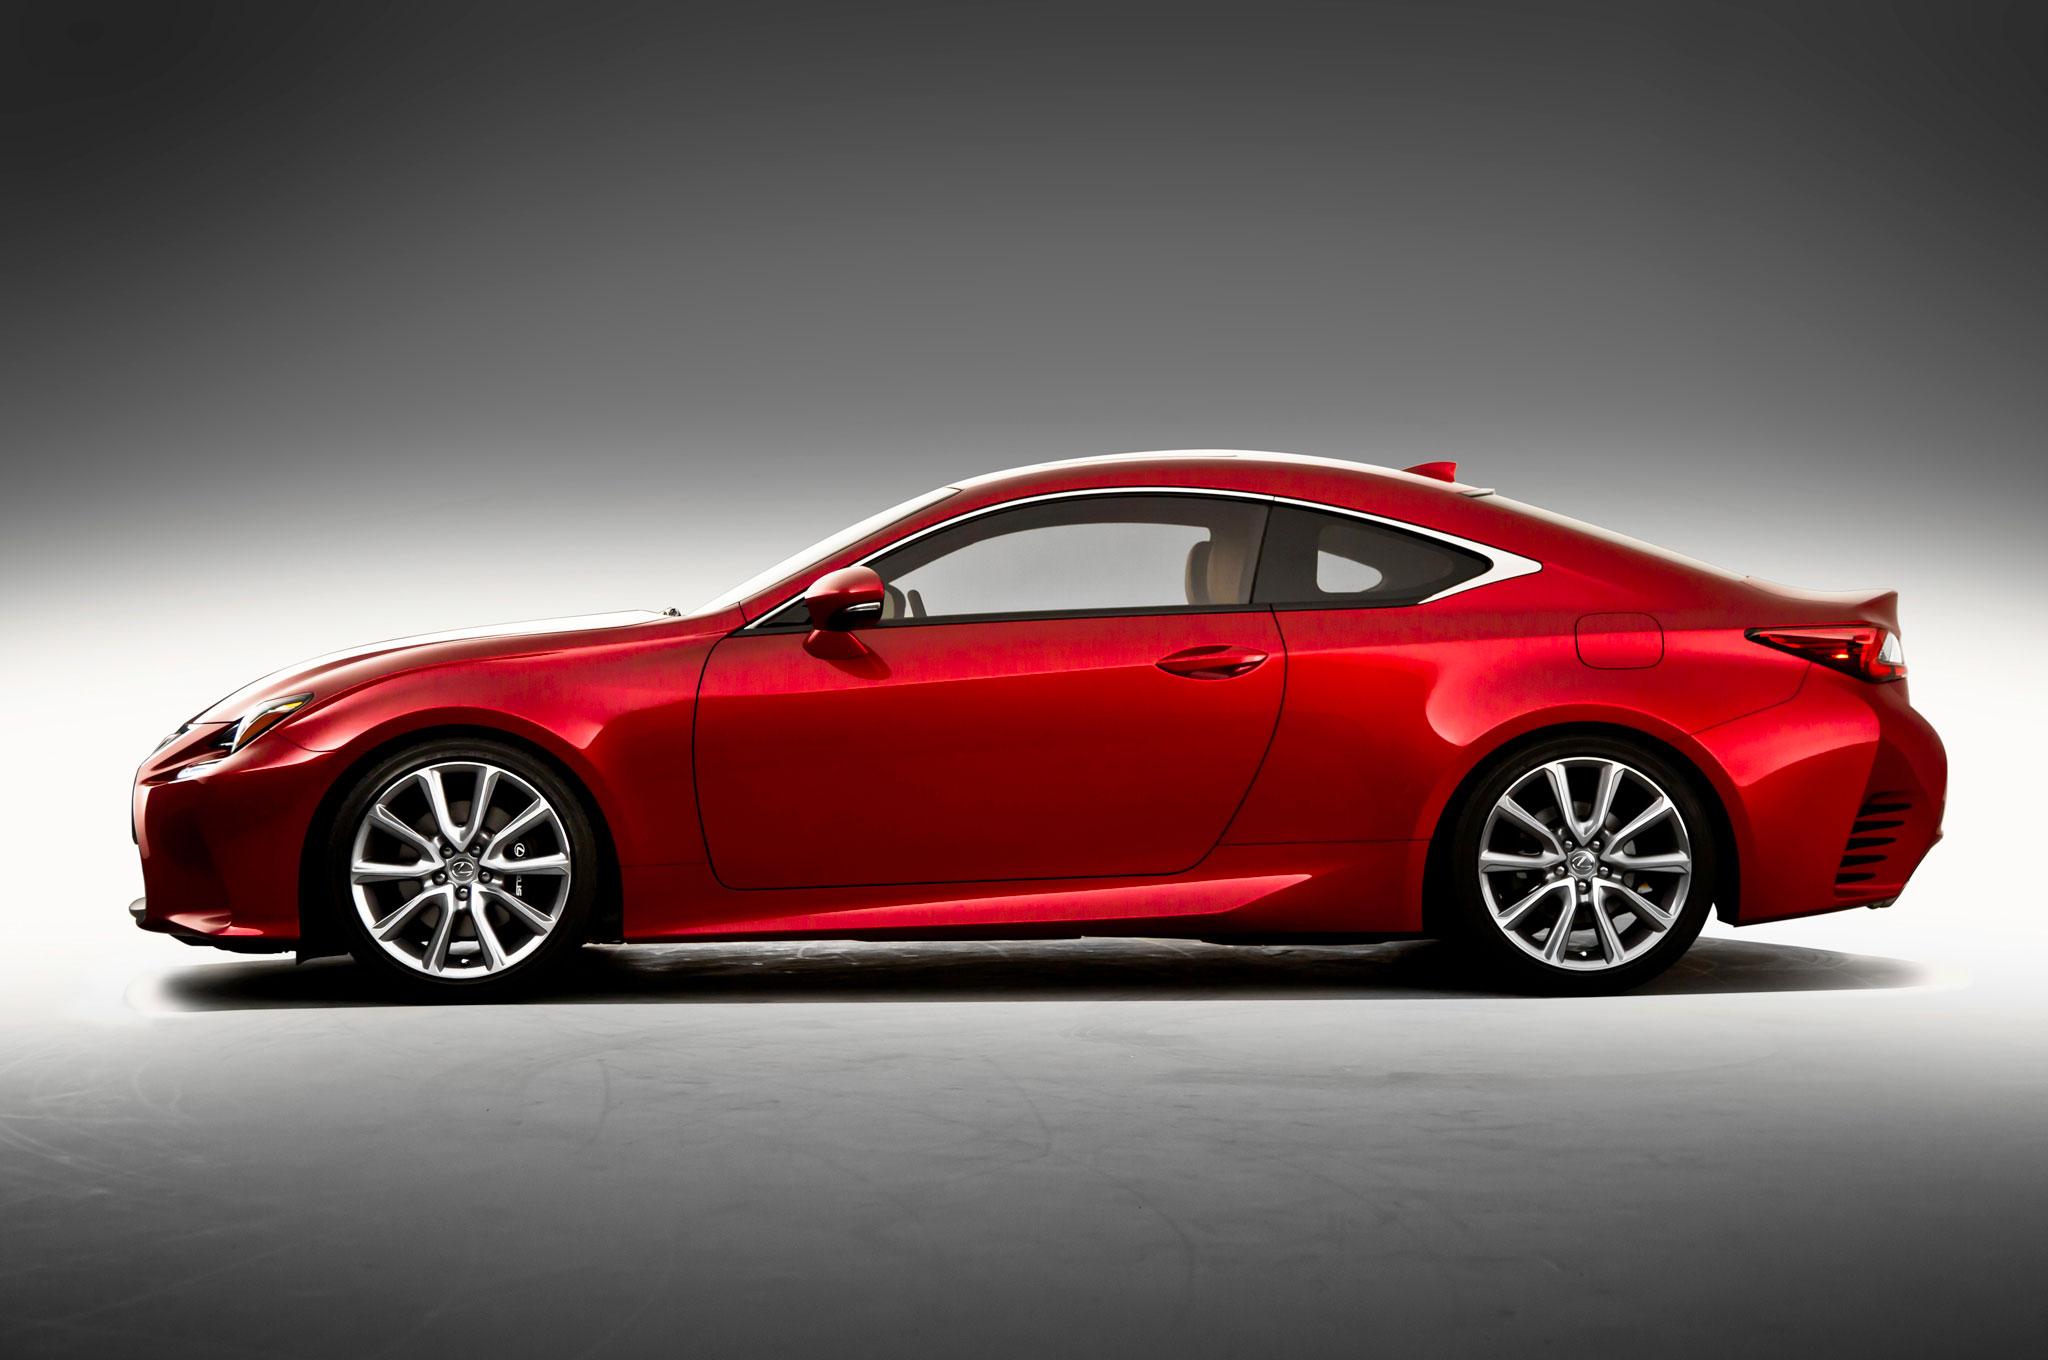 More Photos of the Lexus RC Coupe | Lexus Enthusiast